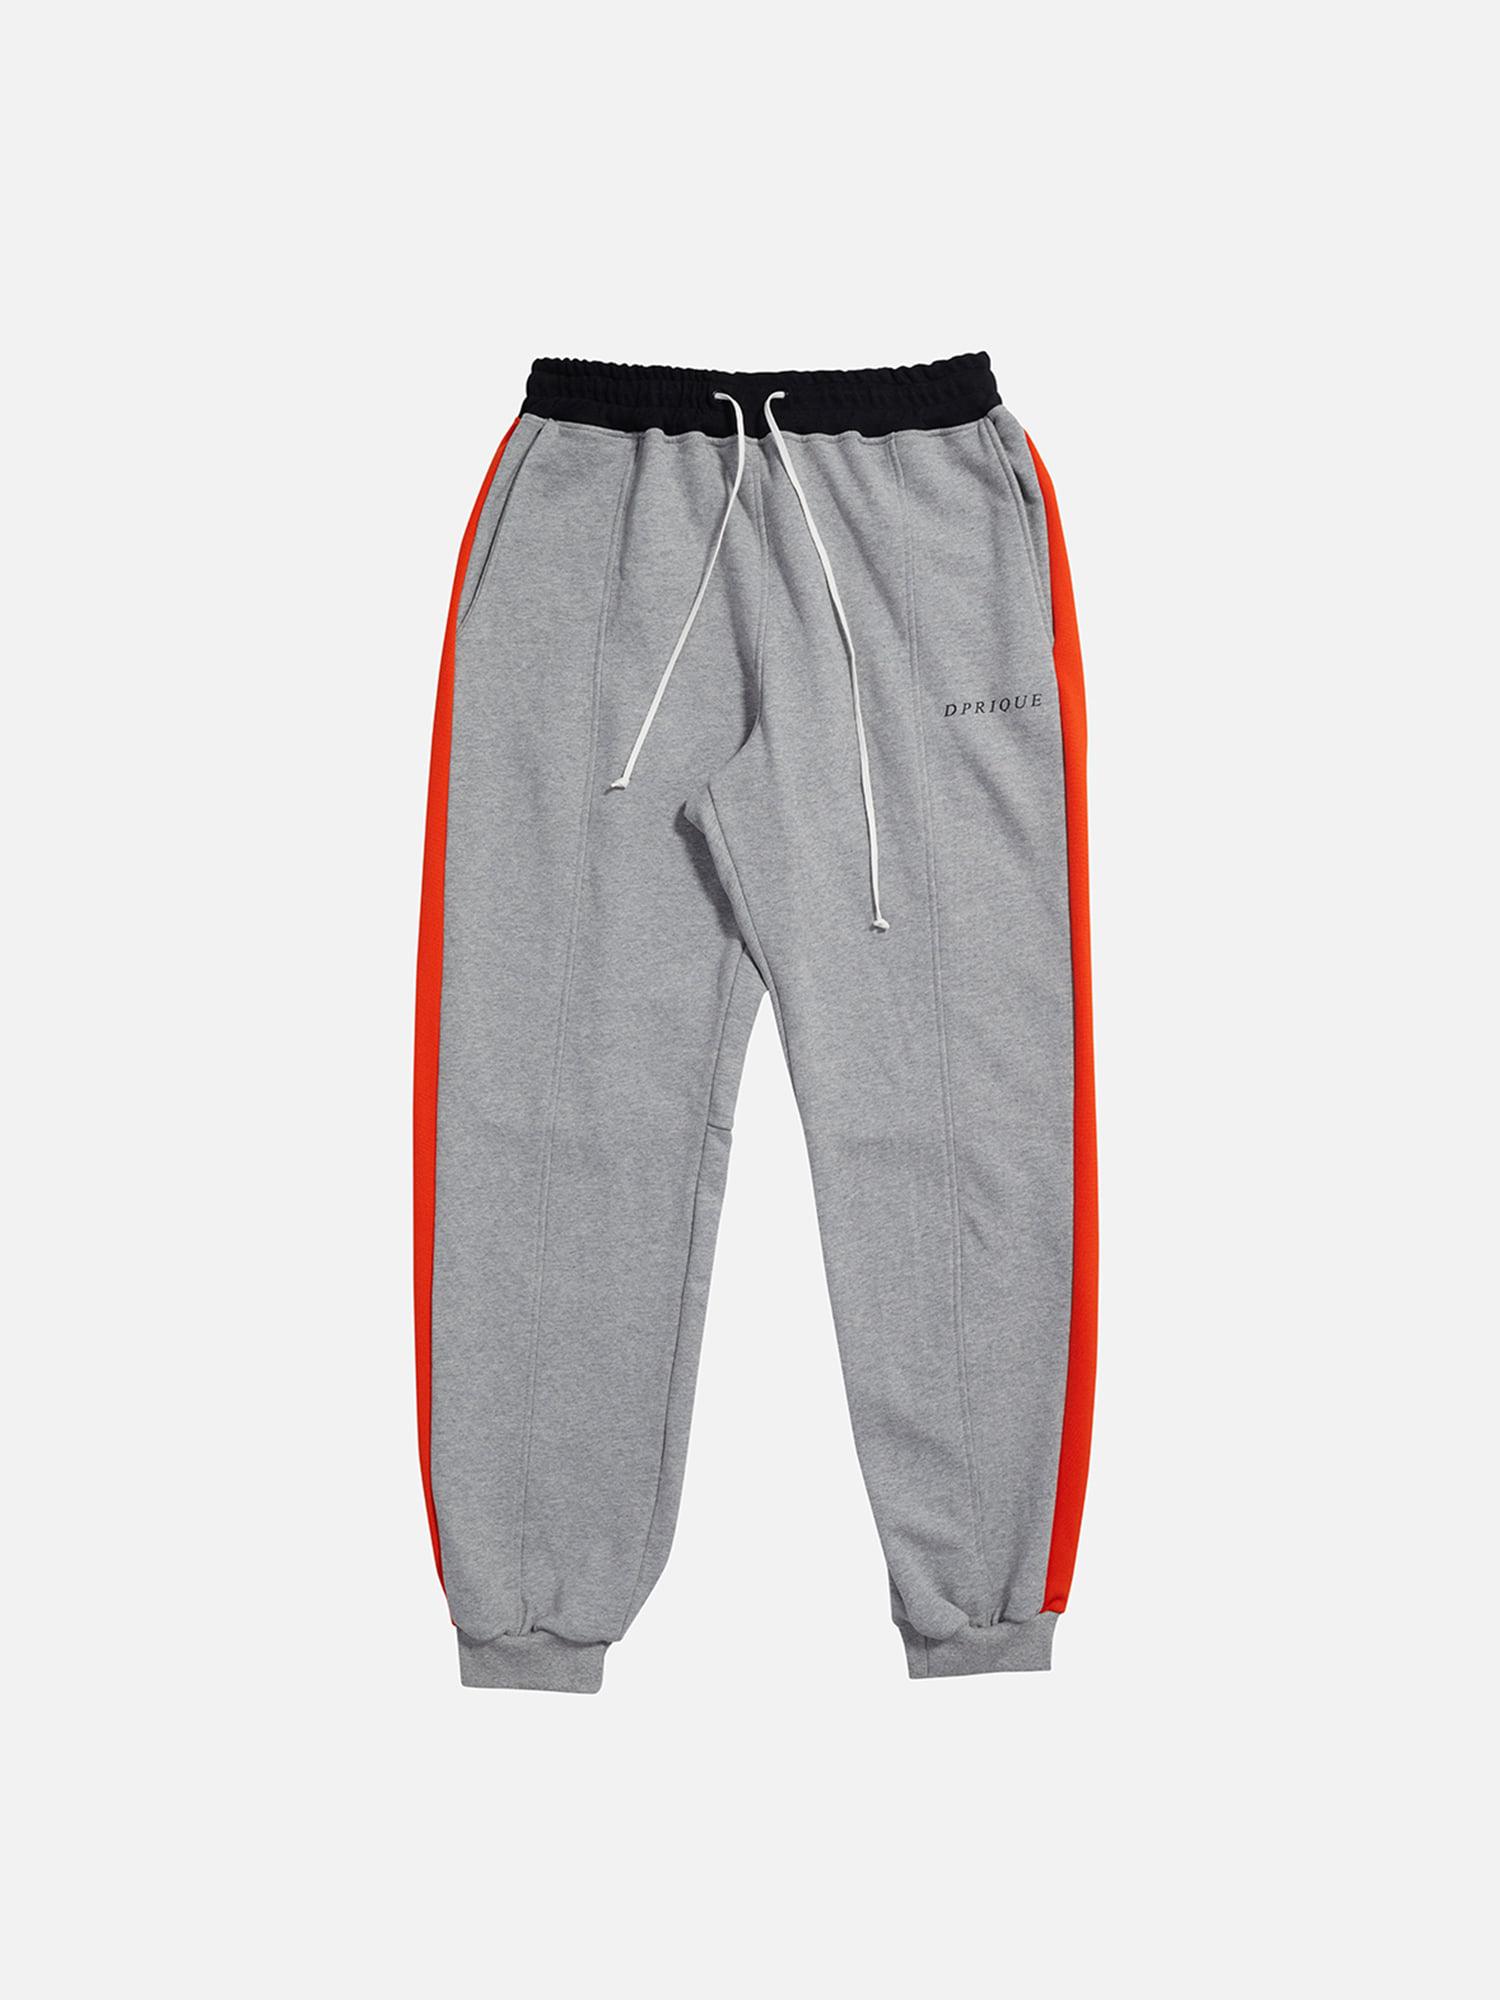 07 Track Jogger Pants - Grey/Orange